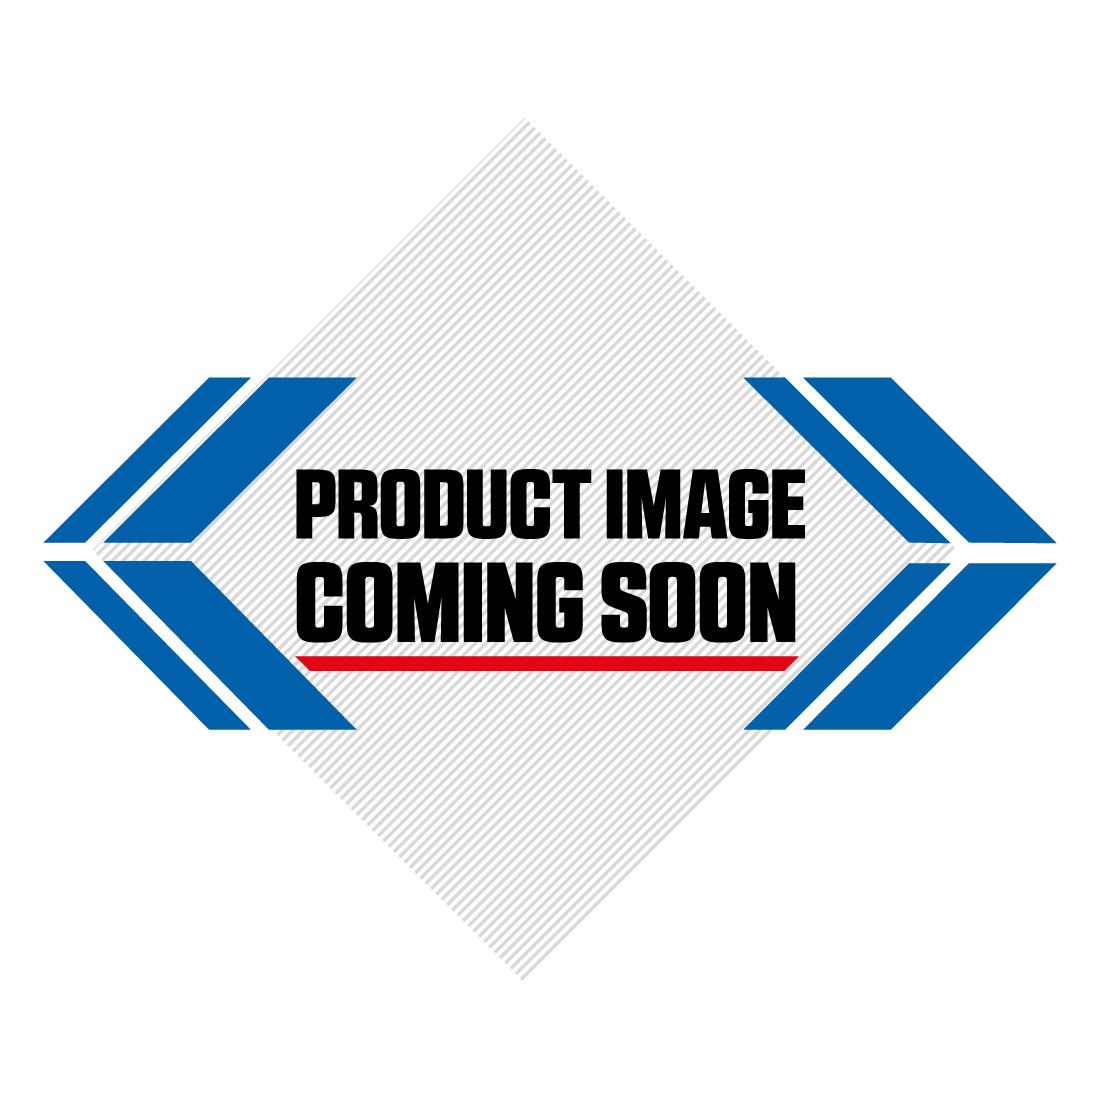 Renthal Twinring Rear Sprocket KTM SX SX-F EXC EXC-F Husqvarna TC FC TE FE - Orange Image-2>